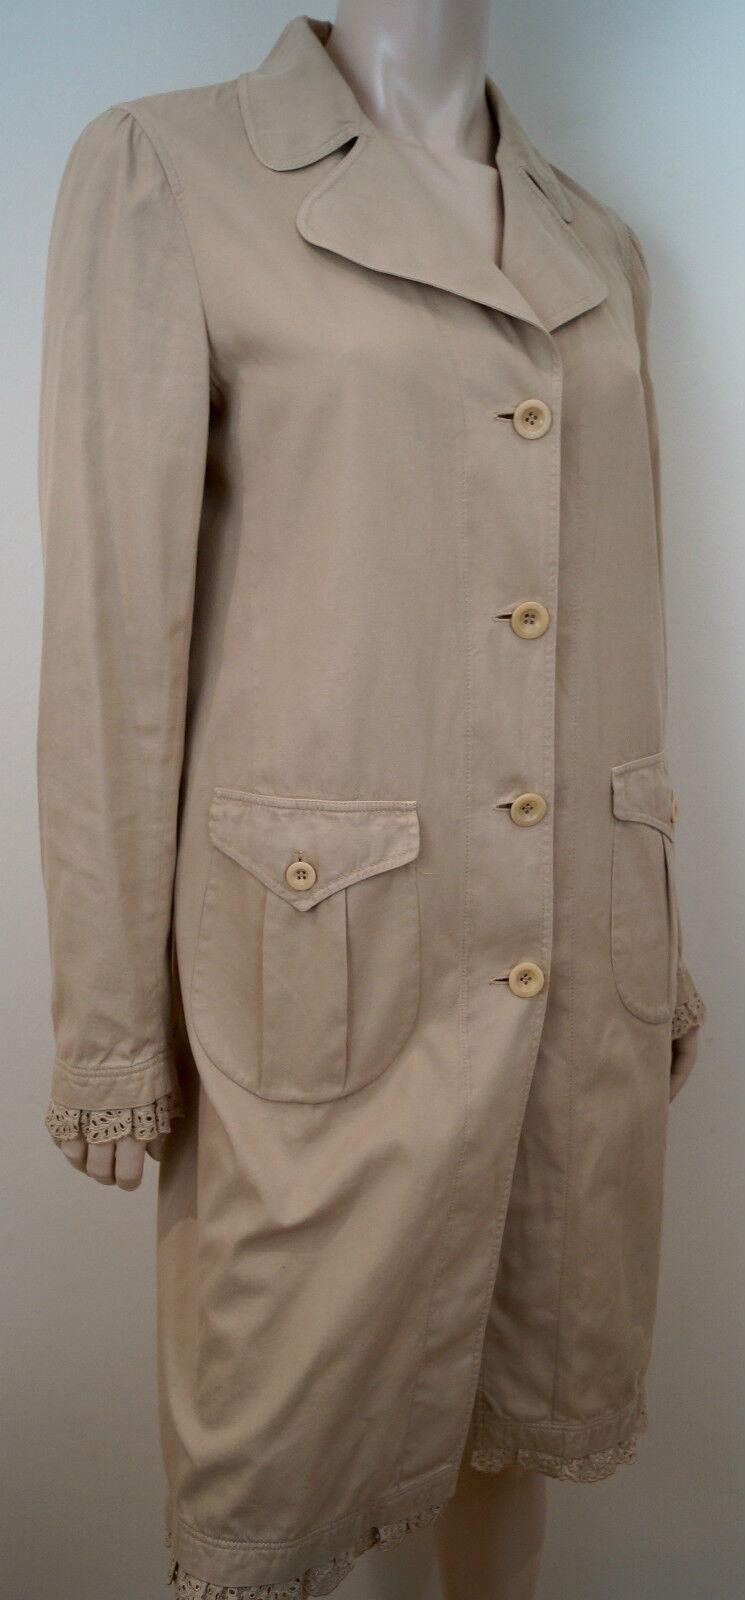 MIU MIU Beige Cotton Collared Crochet Trim Long Sleeve Mac Trench Coat 44 UK12